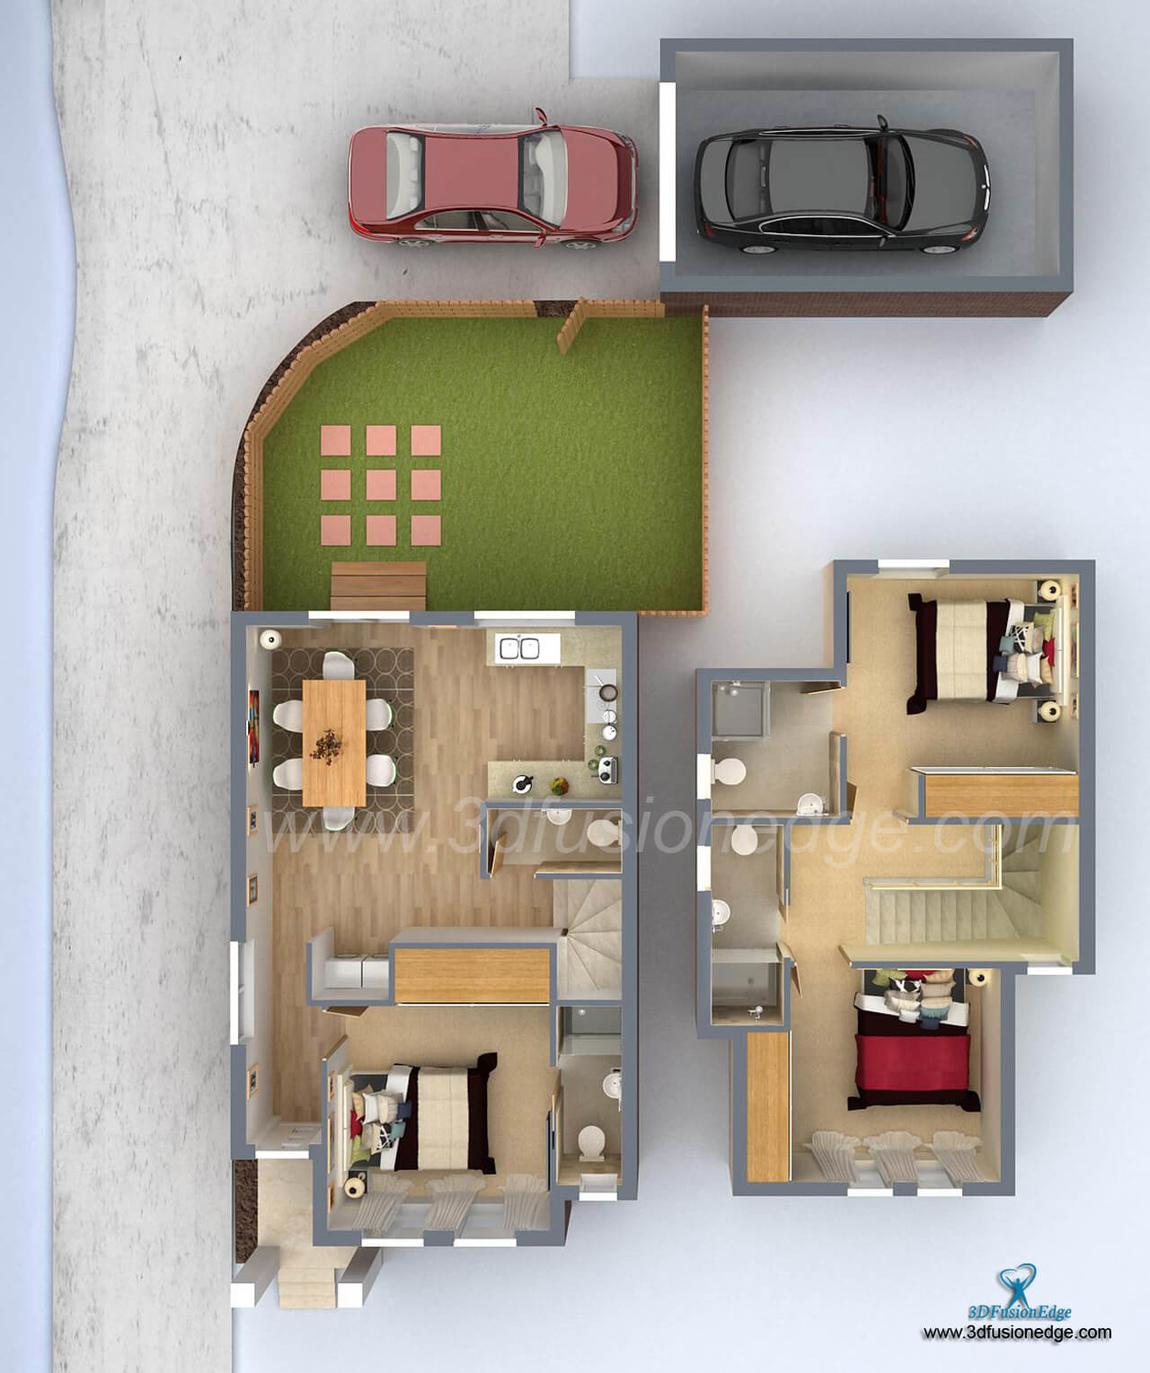 3dfusionedge - 3D Floor Plan Top View Whole Interior